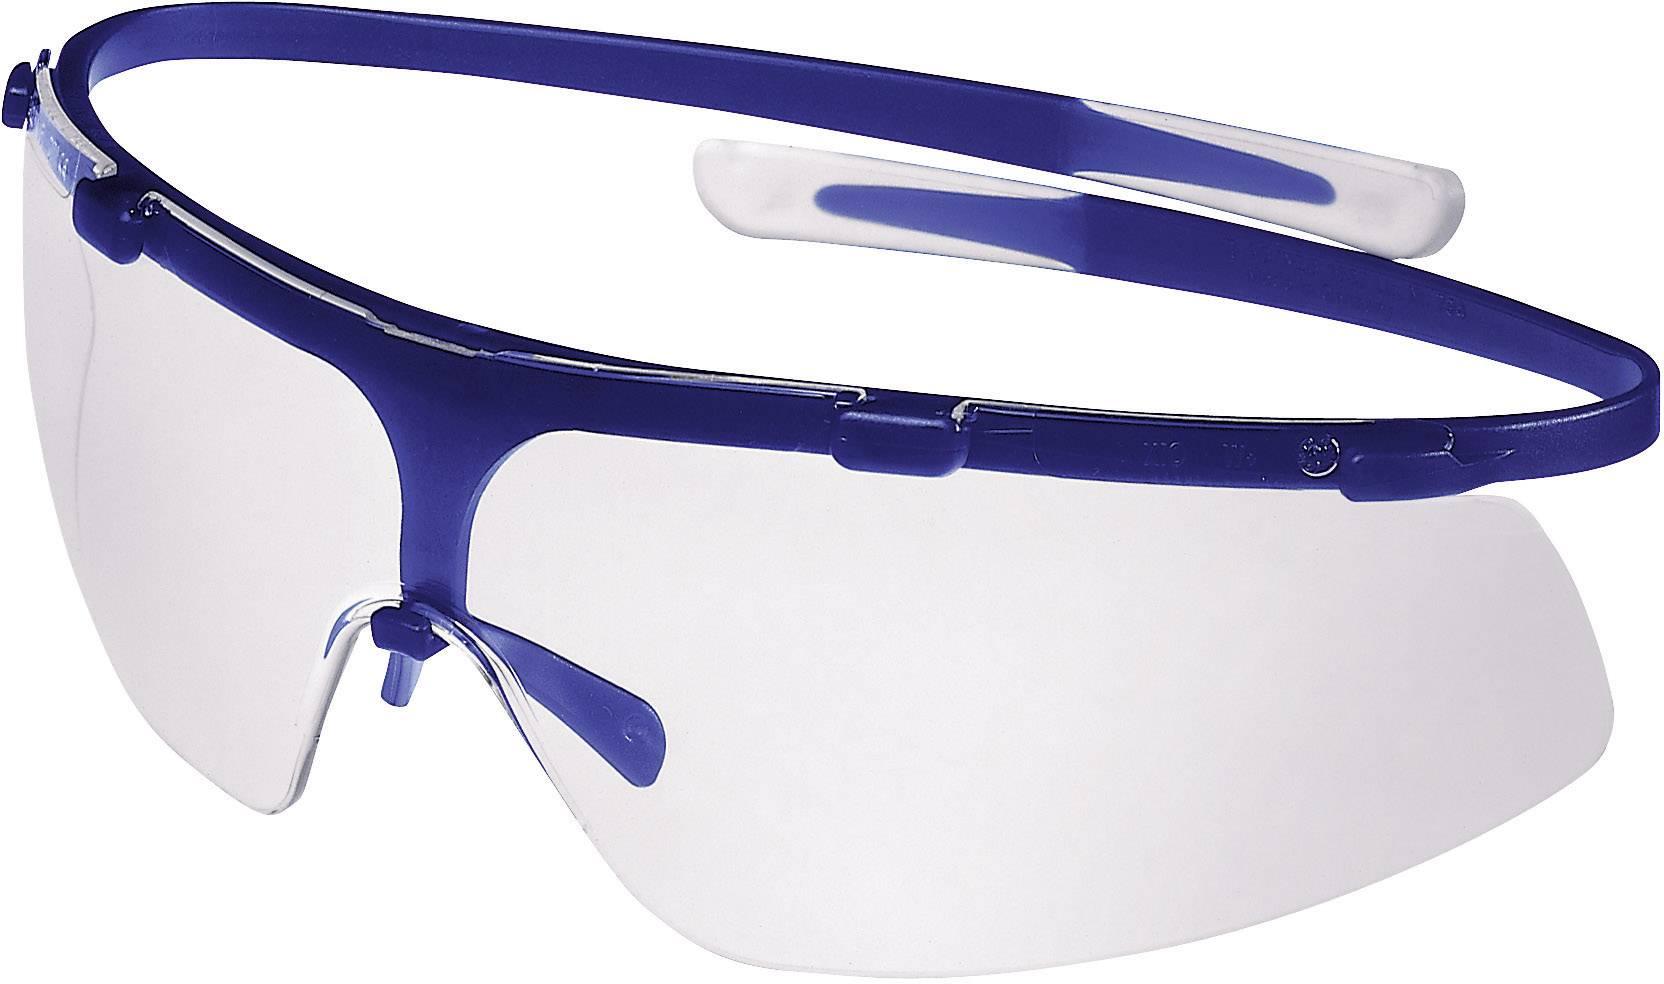 Ochranné brýle Uvex SuperG, 9172 265, transparentní